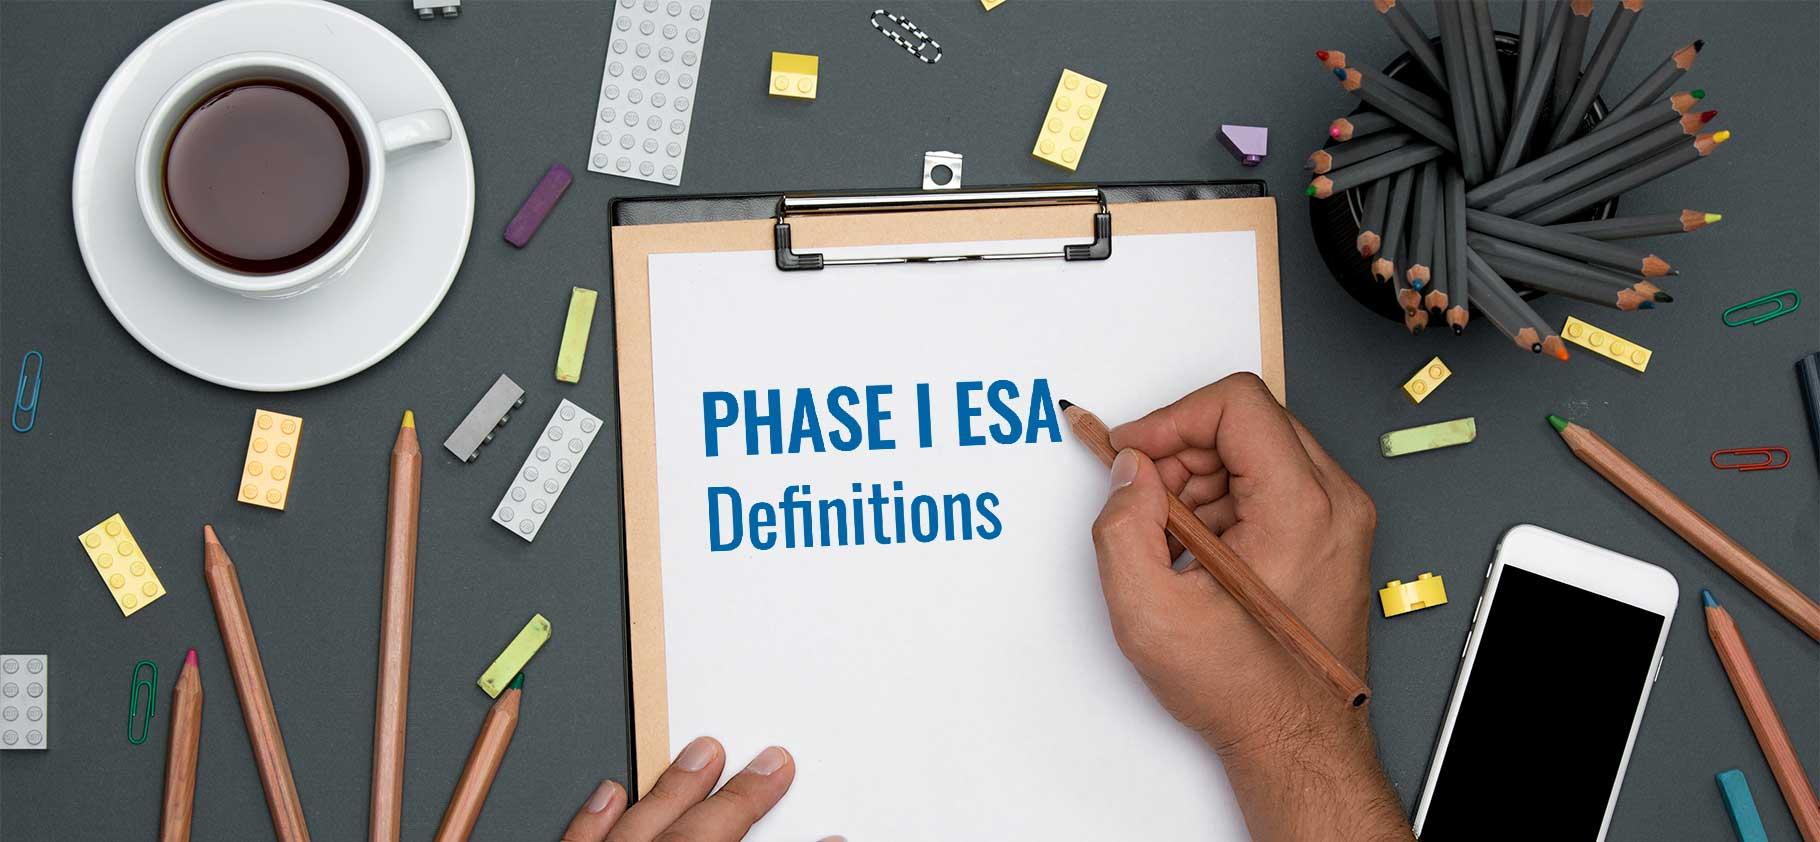 Phase I ESA Definitions